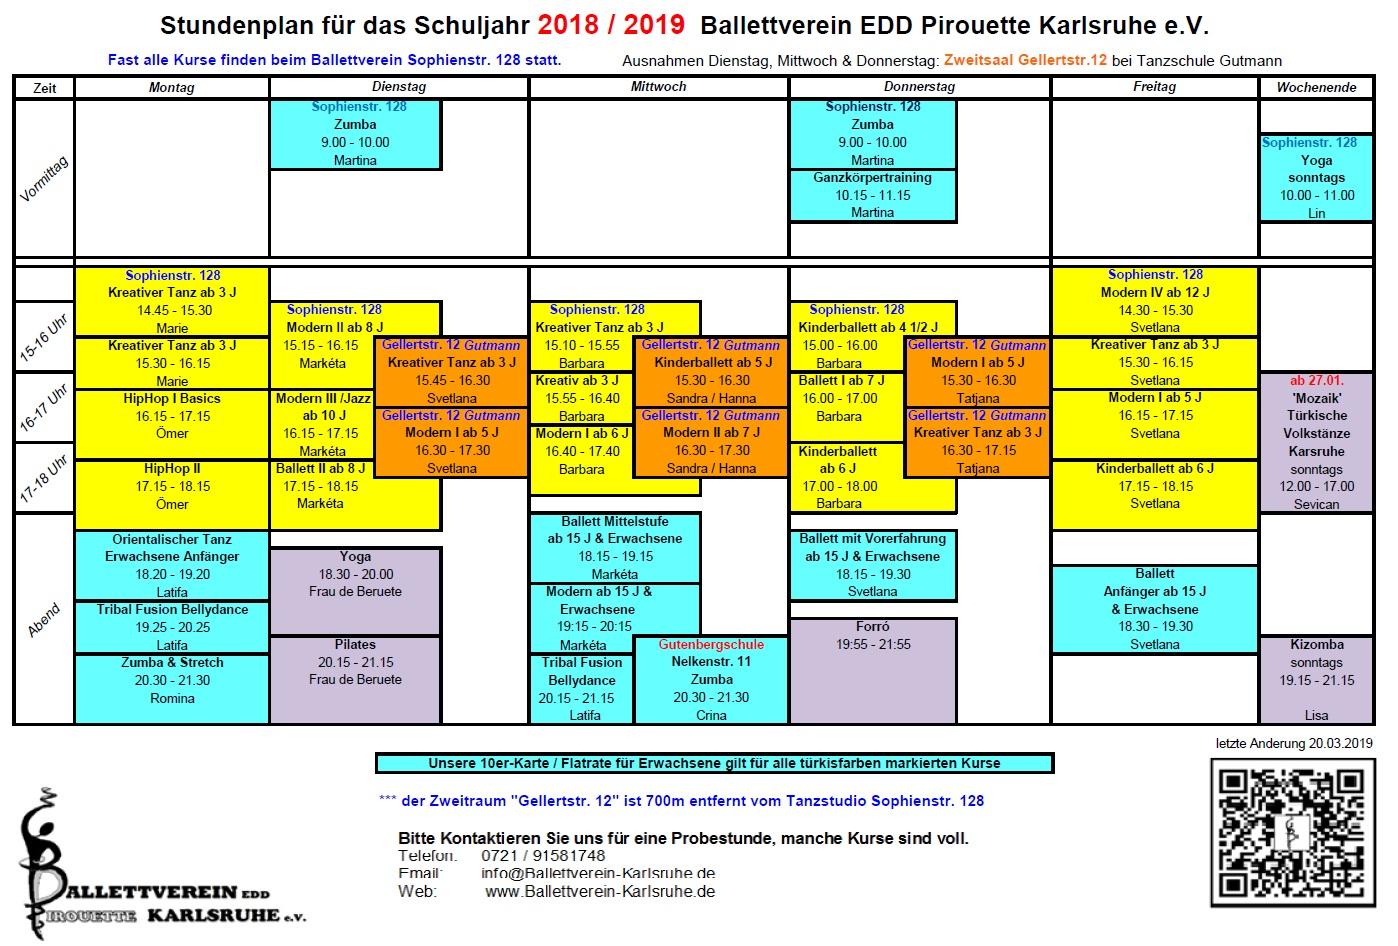 Stundenplan_Ballett_Ballettschule_Karlsruhe_Modern_Dance_Flamenco_Tanzschule_2018